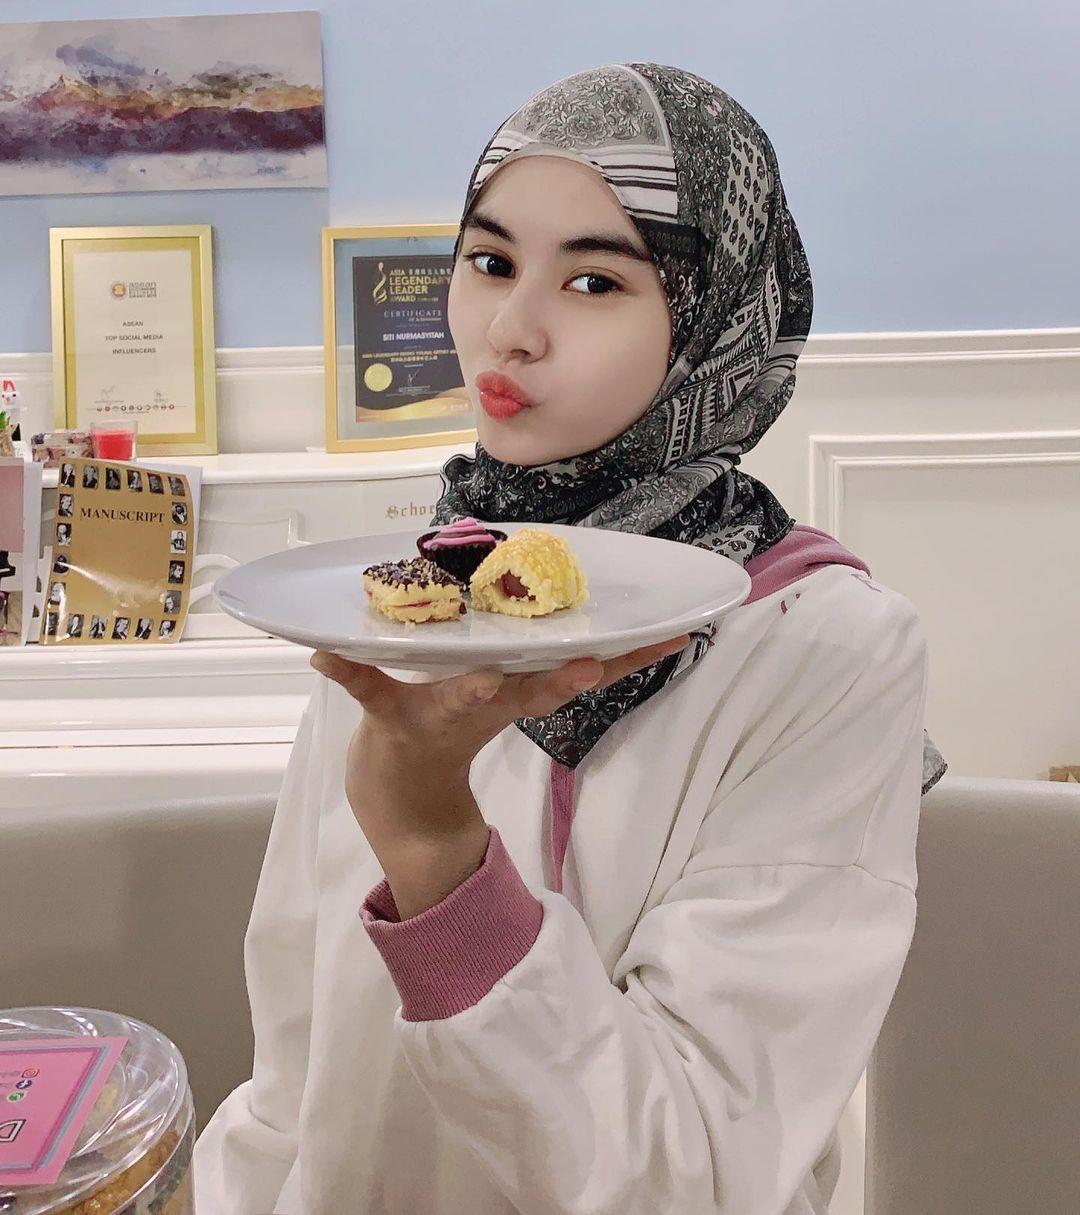 Penyanyi Malaysia Sukses Jualan Kue di Tengah Pandemi